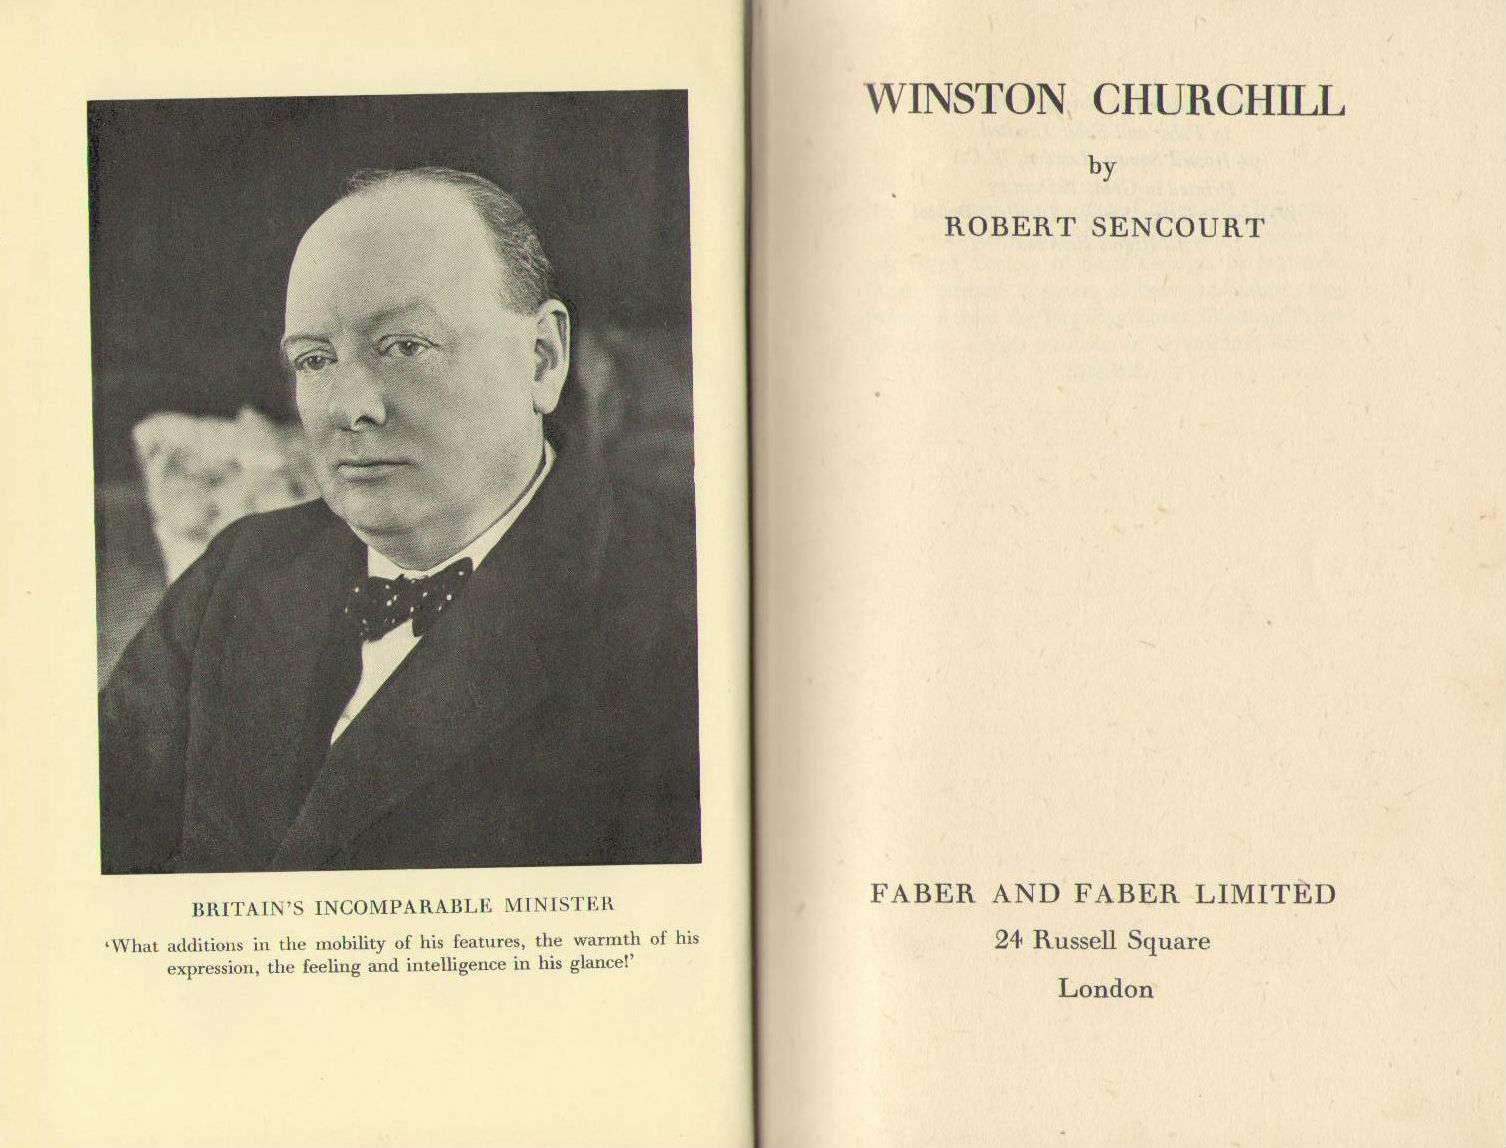 WINSTON CHURCHILL., (Winston Churchill) SENCOURT, Robert.